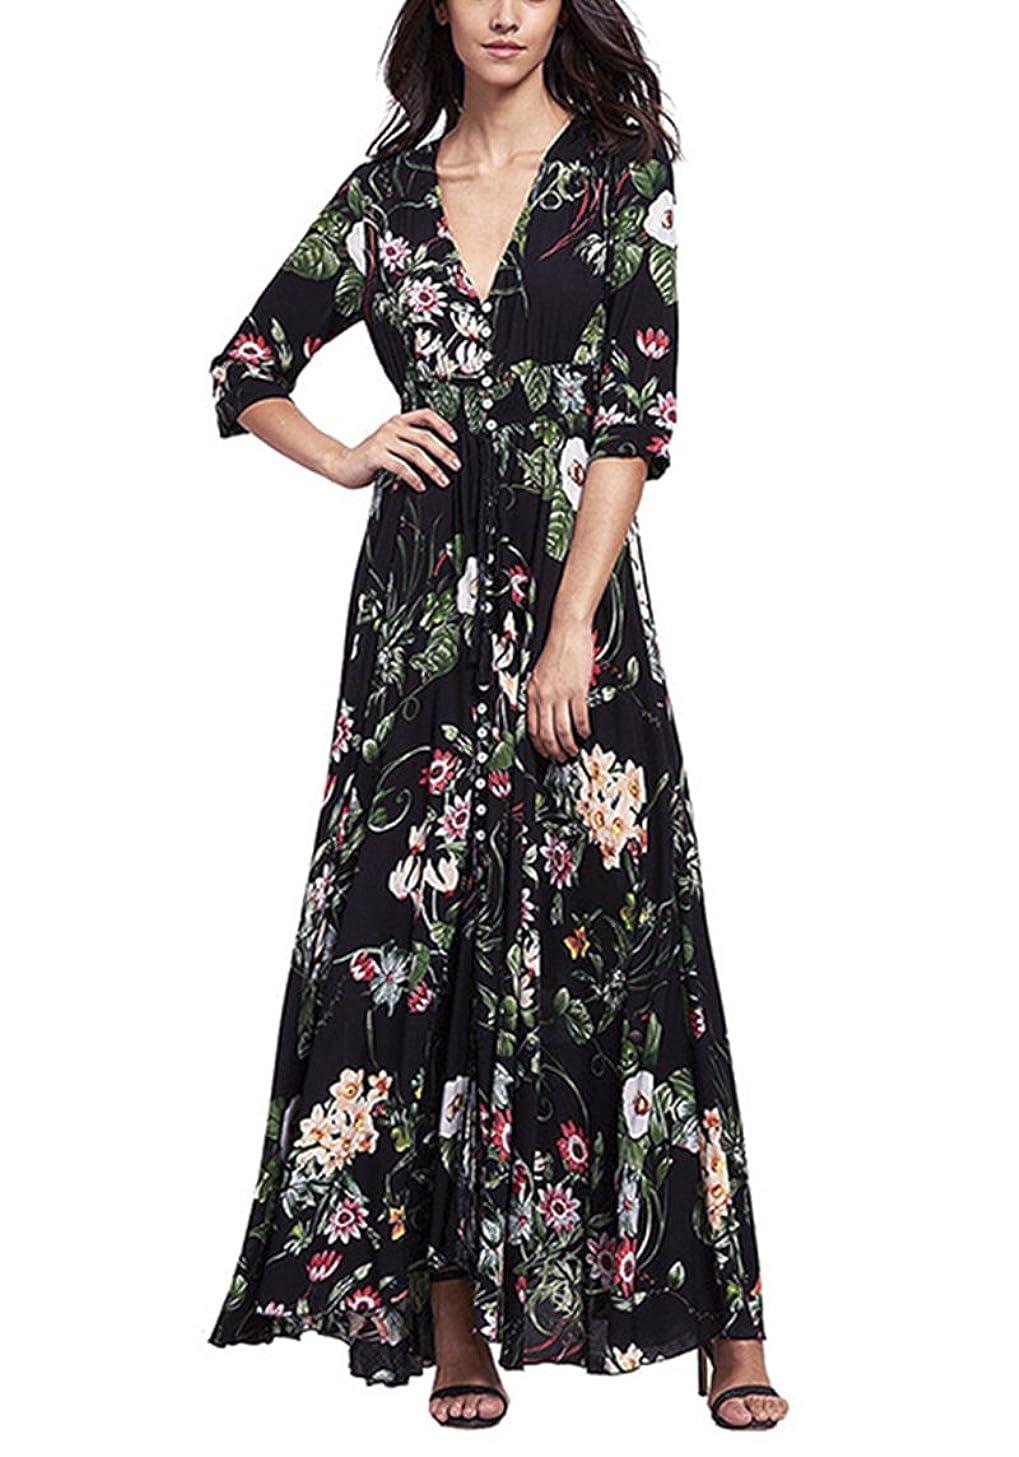 Chérie Fille Women's V-Neck Button up Split Dress One-Half Sleeves Dresses Bohemian Floral Print Flowy Party Maxi Dresses